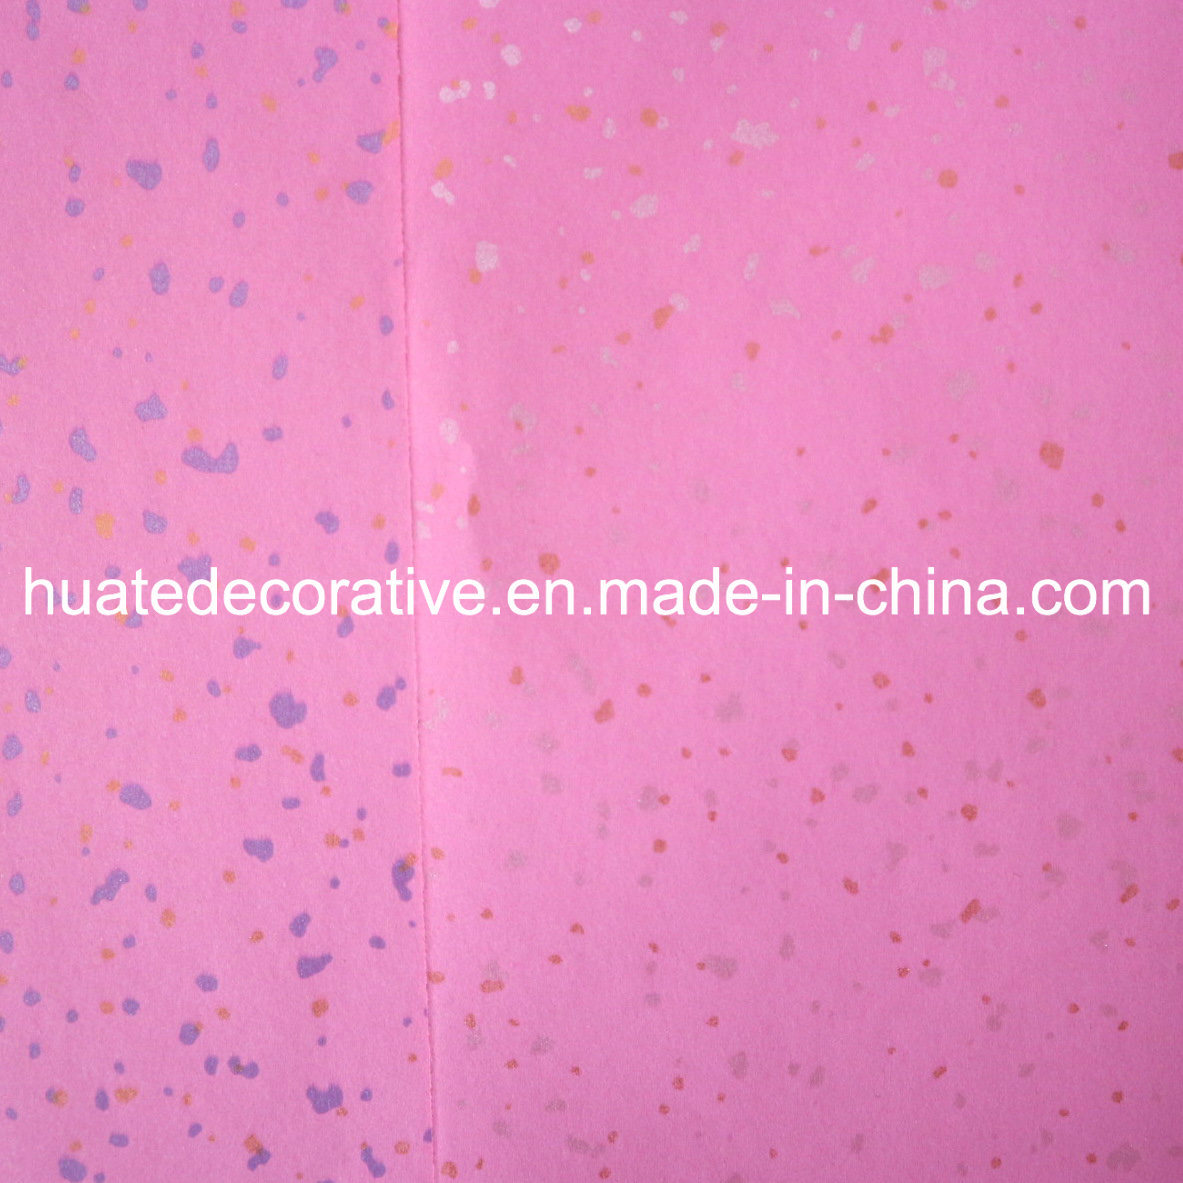 Metallic Melamine Decorative Paper for Furniture, Plywood, MDF, HPL